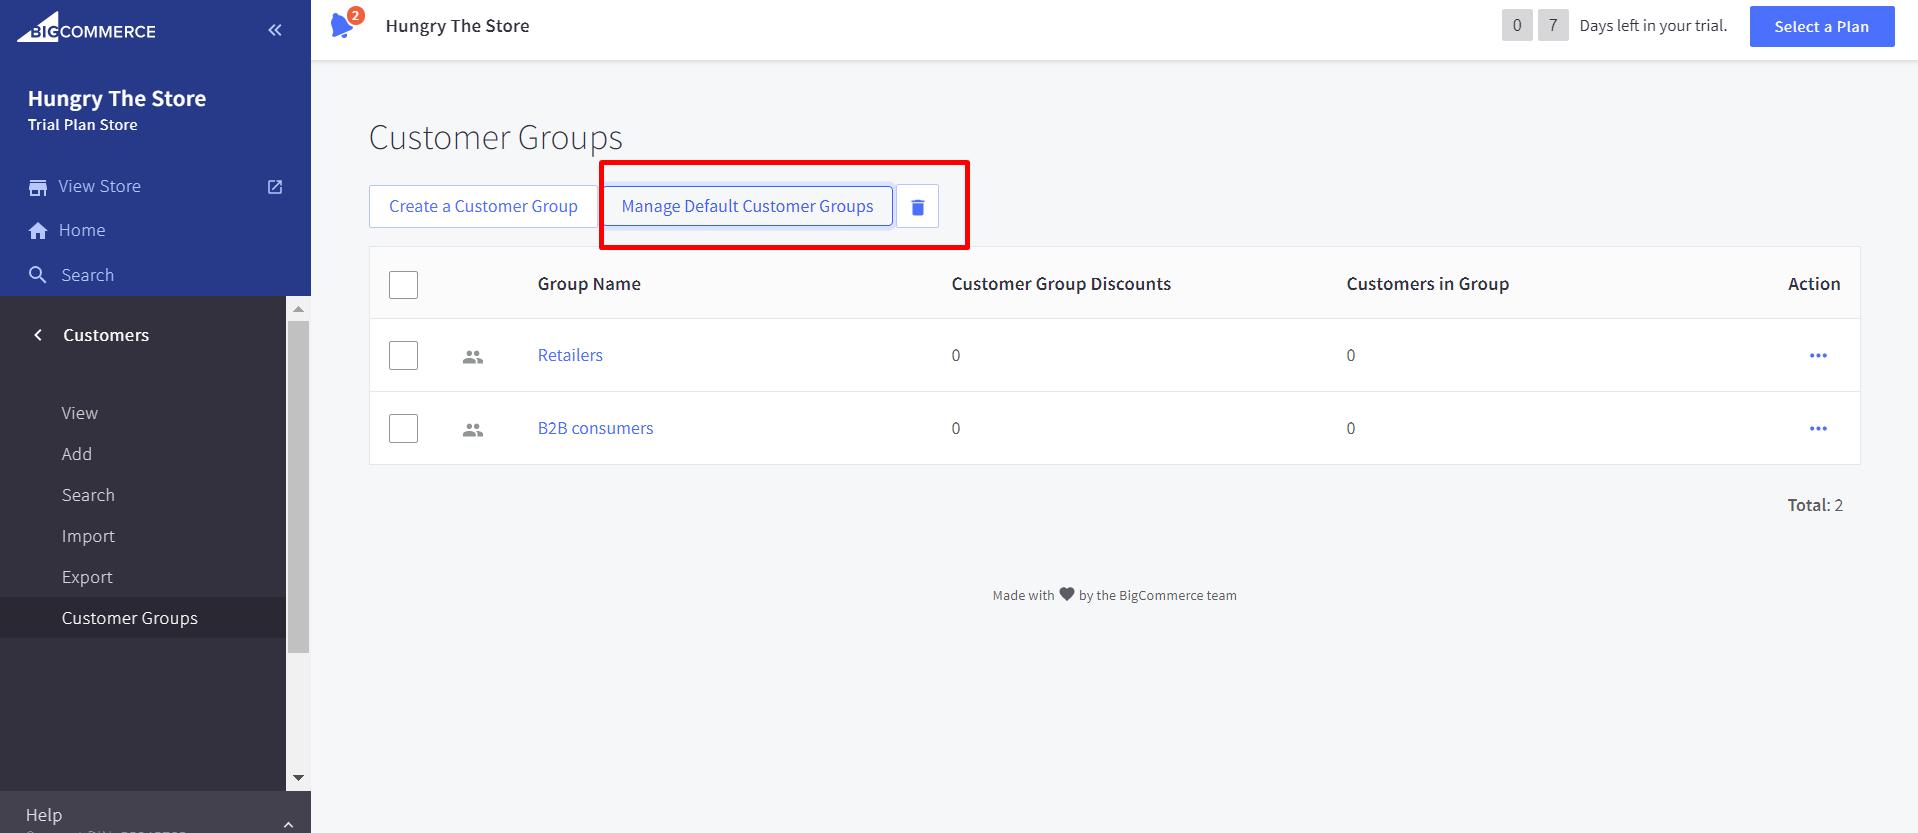 Manage Default Customer Groups